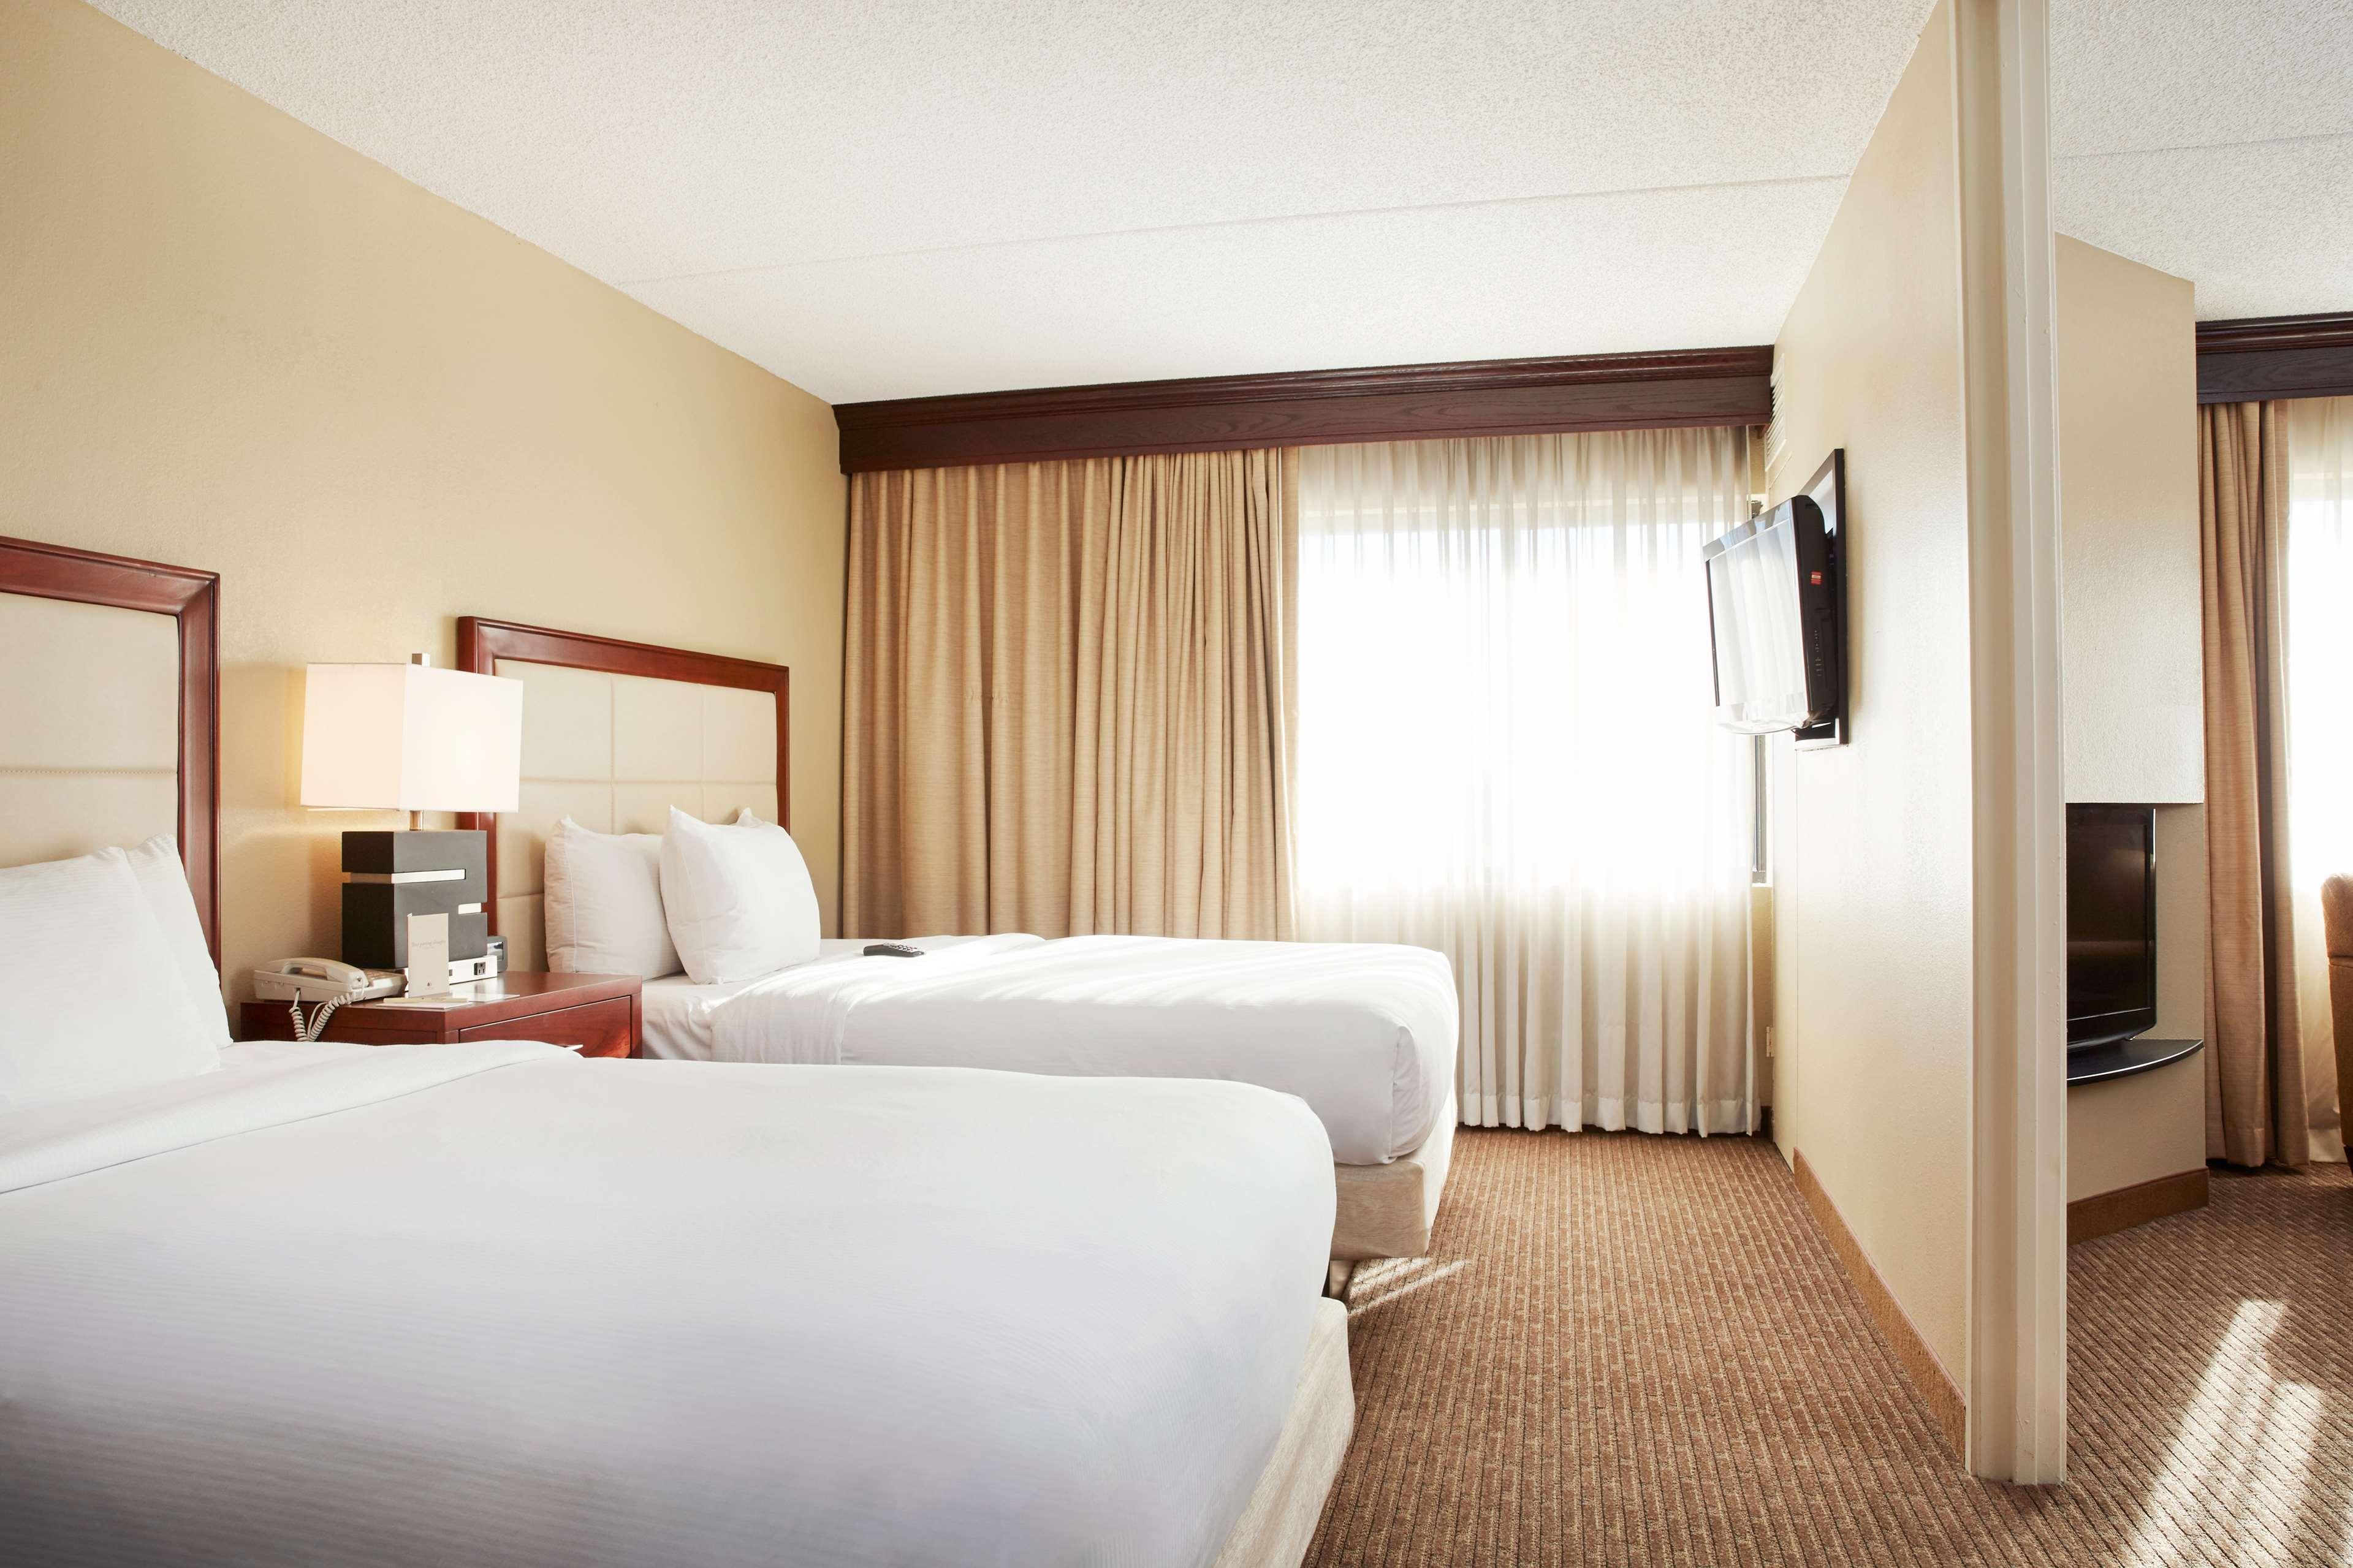 DoubleTree Suites by Hilton Hotel Cincinnati - Blue Ash image 14